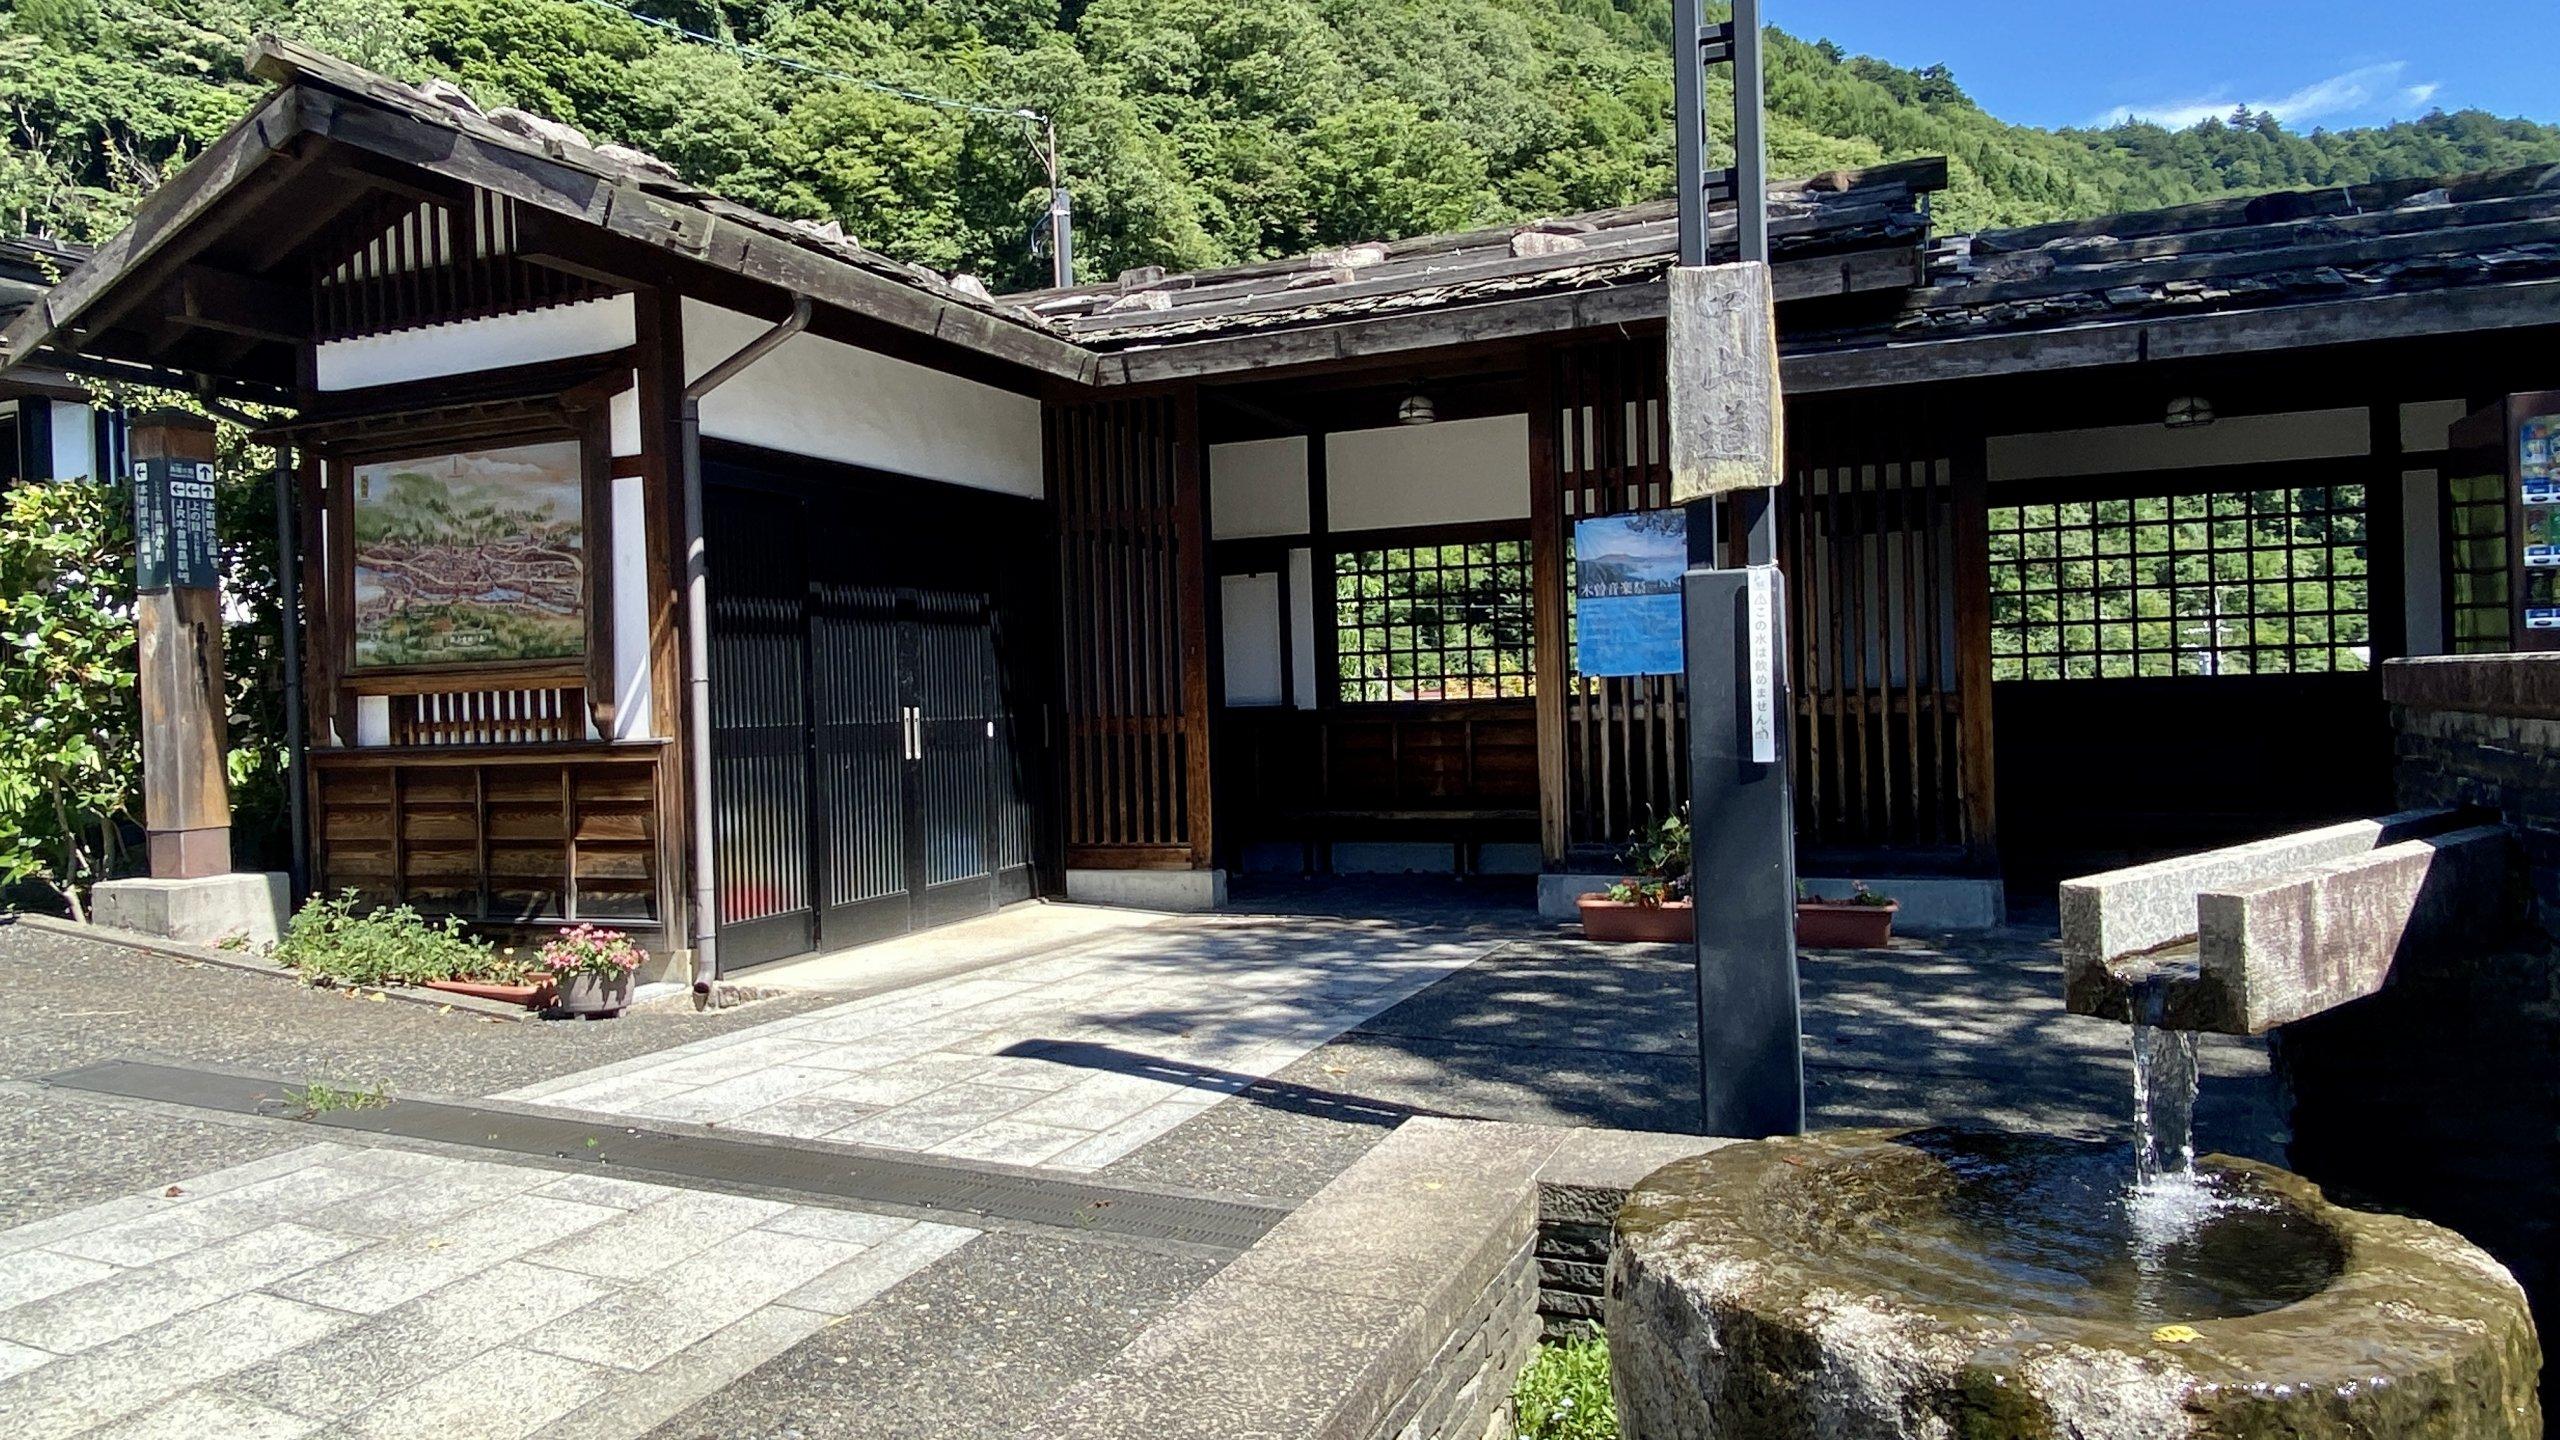 Fukushima-juku Nakasendo kisoji